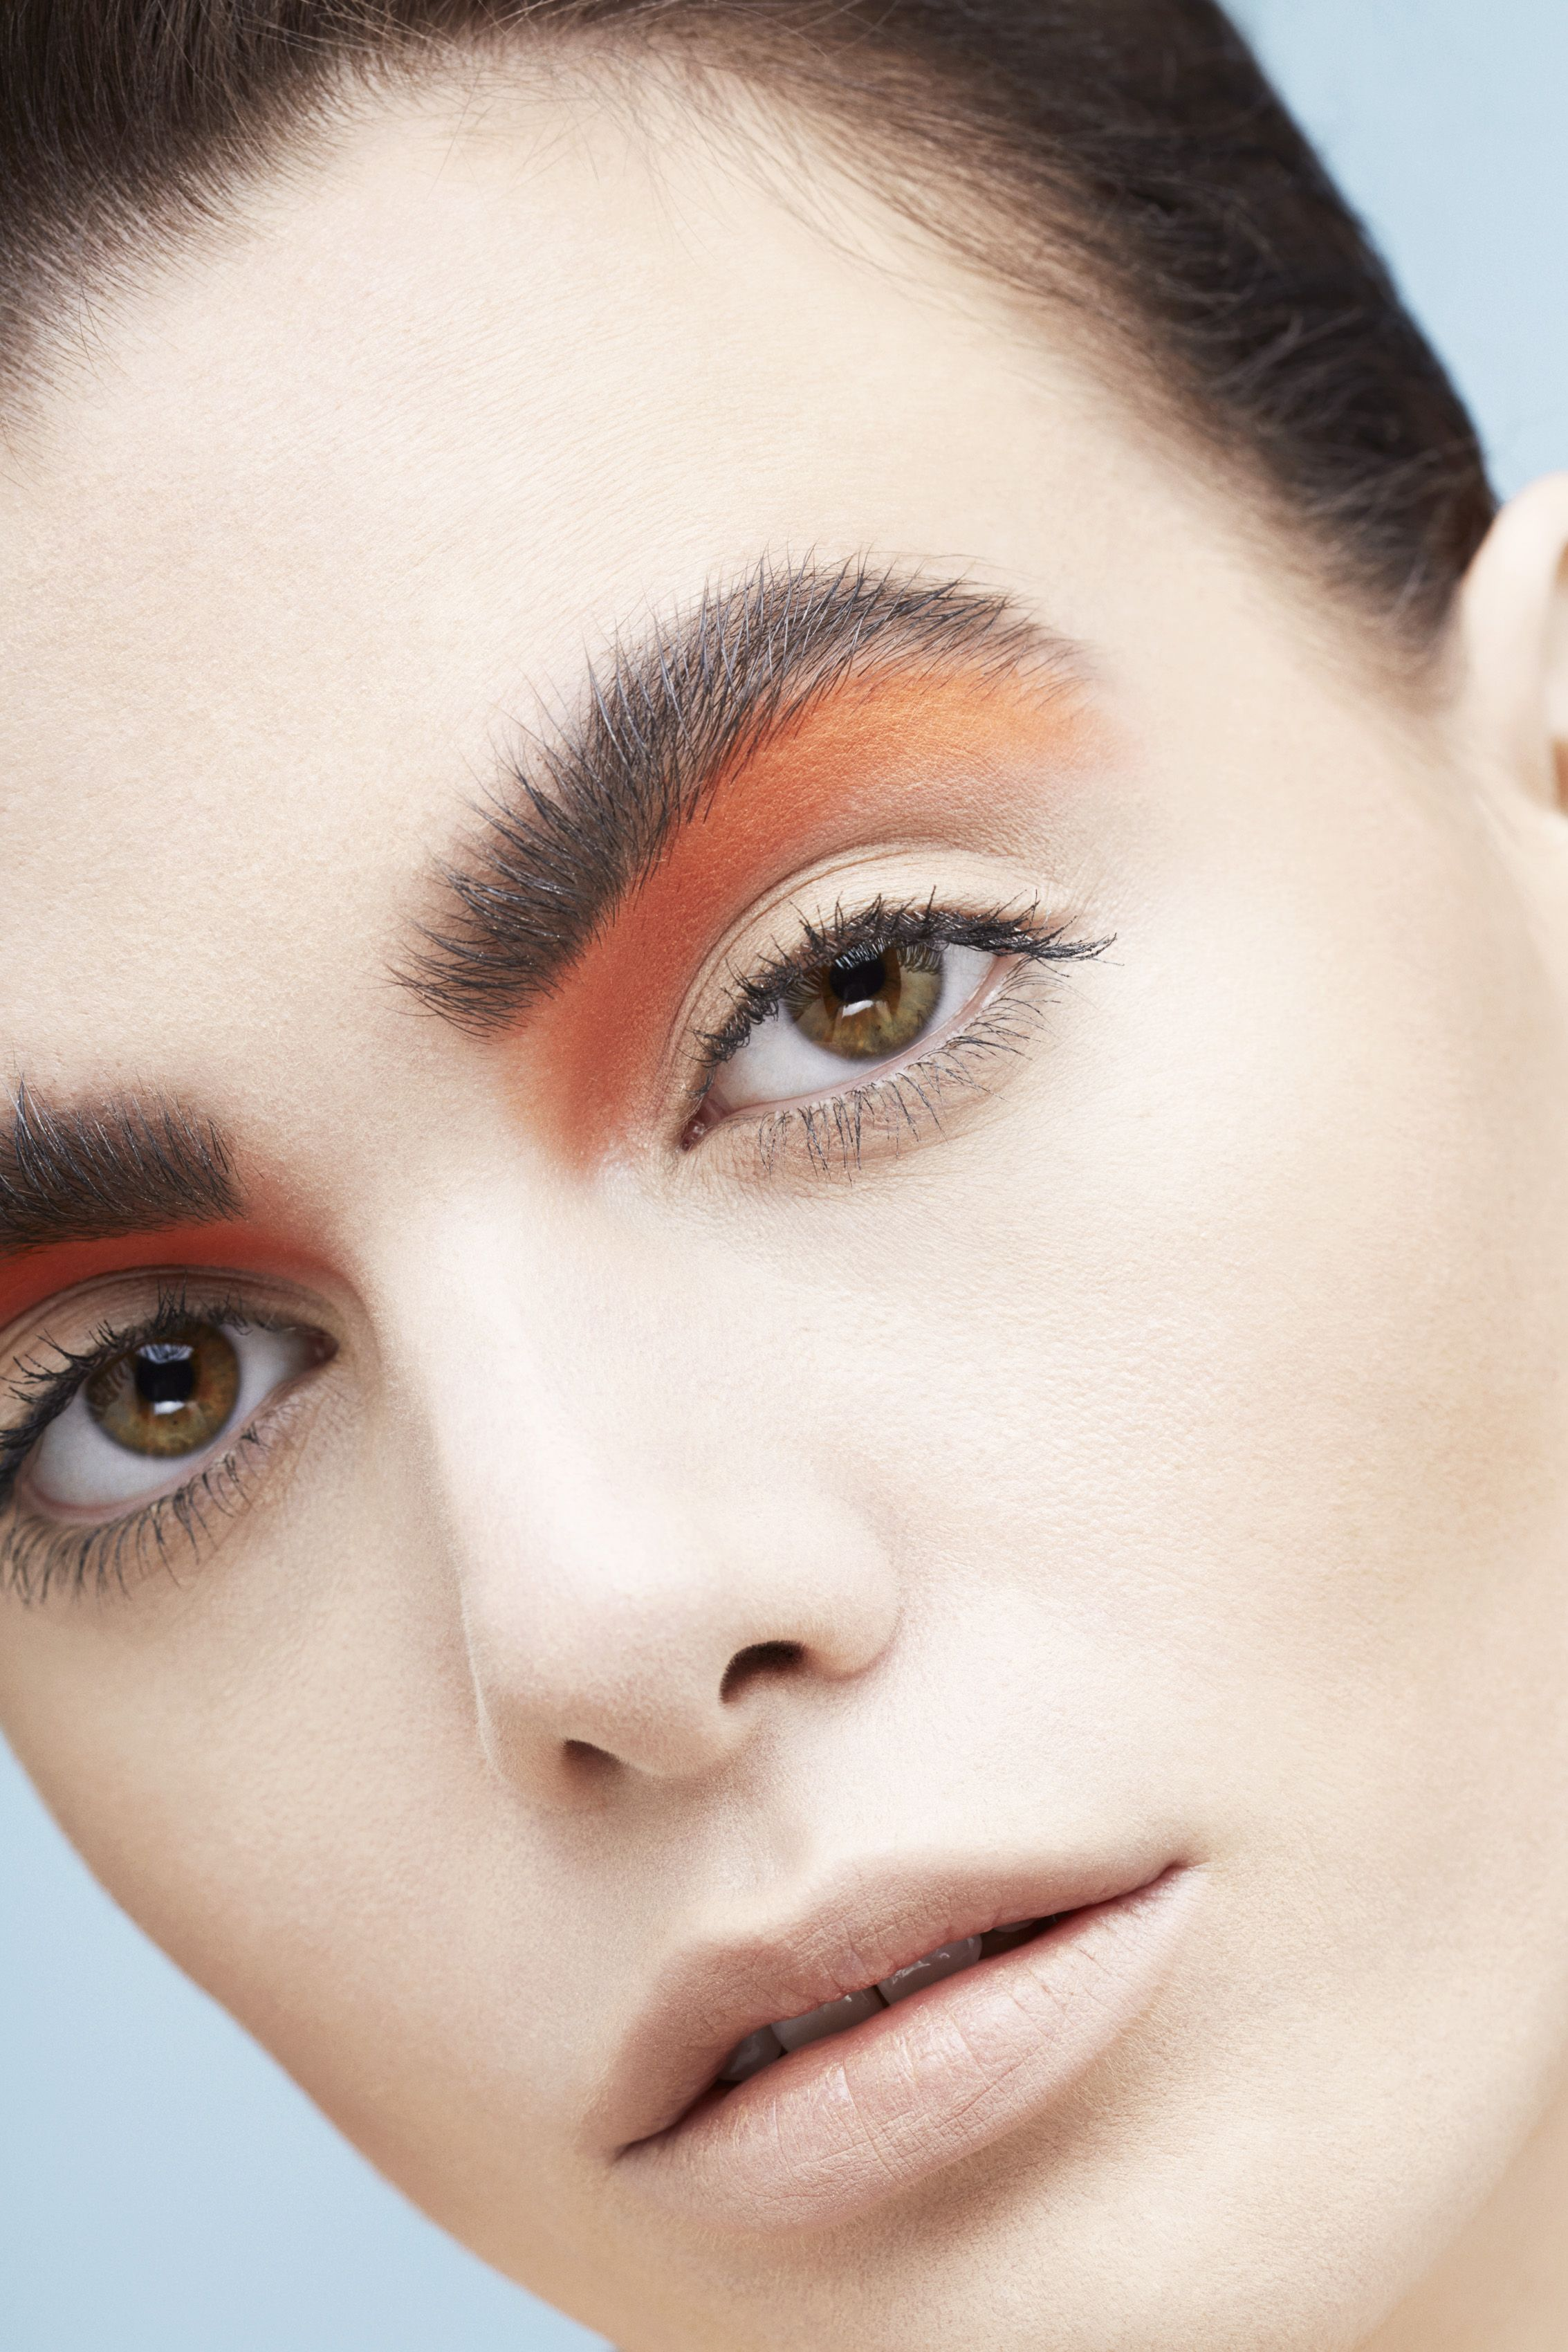 Christine Kreiselmaier photography in Harper's Bazaar Vietnam, Autumn issue 2015, Makeup Sarah Jagger, Hair Delphine Bonnet, Model Charli Howard @ Wilhelmina Models